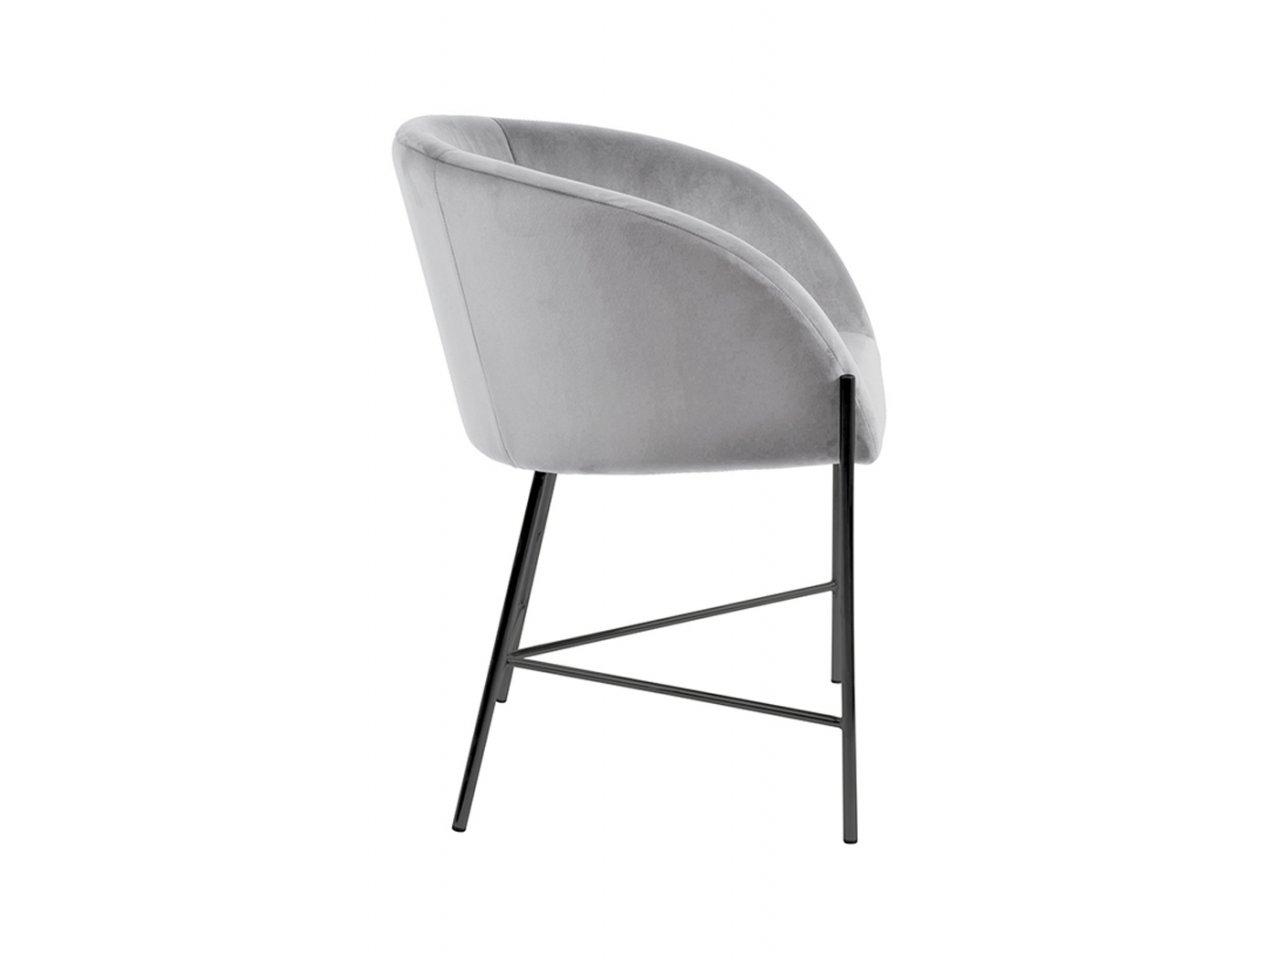 Sedia con braccioli Bobbio -22